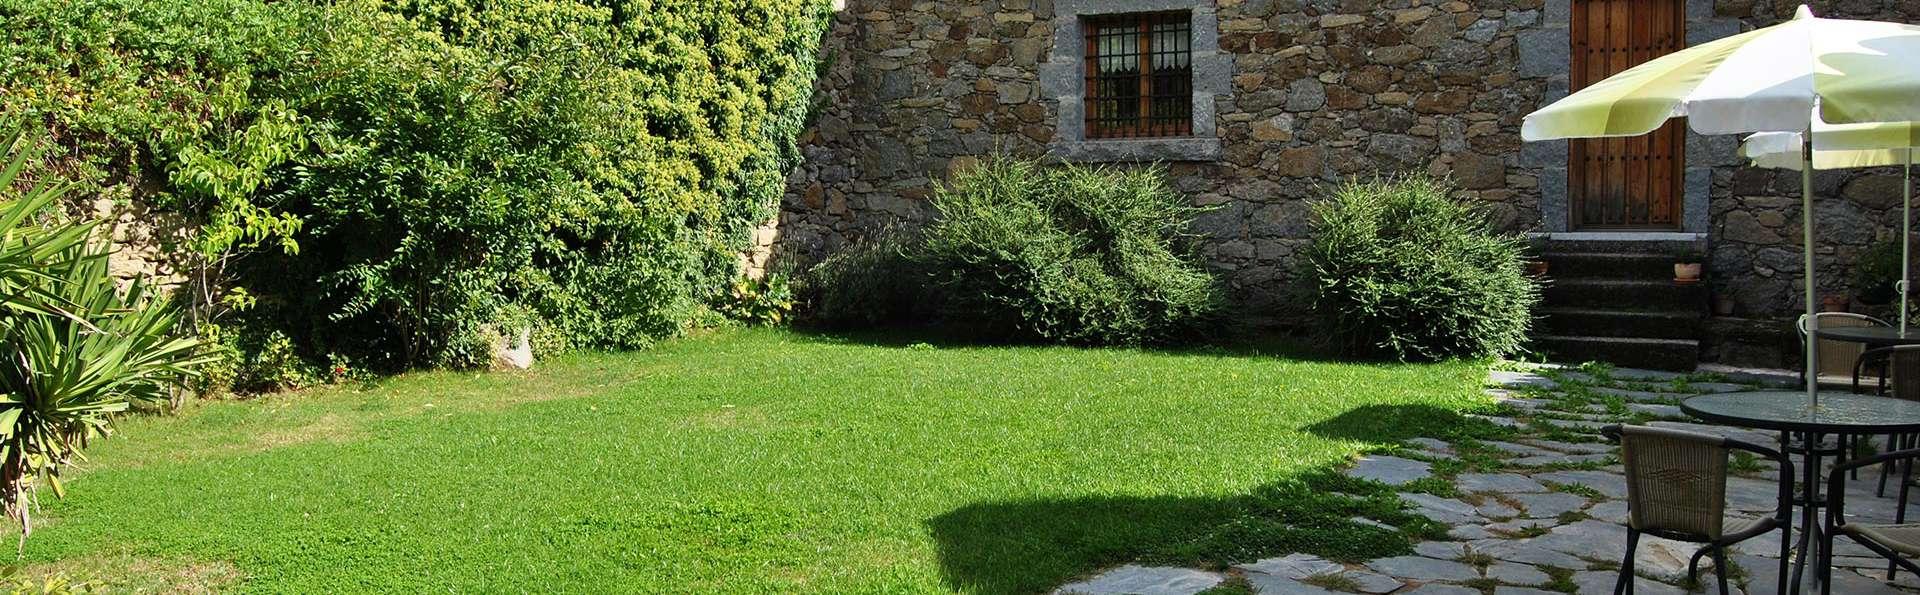 La Trocha De Hoyorredondo - Edit_Garden5.jpg